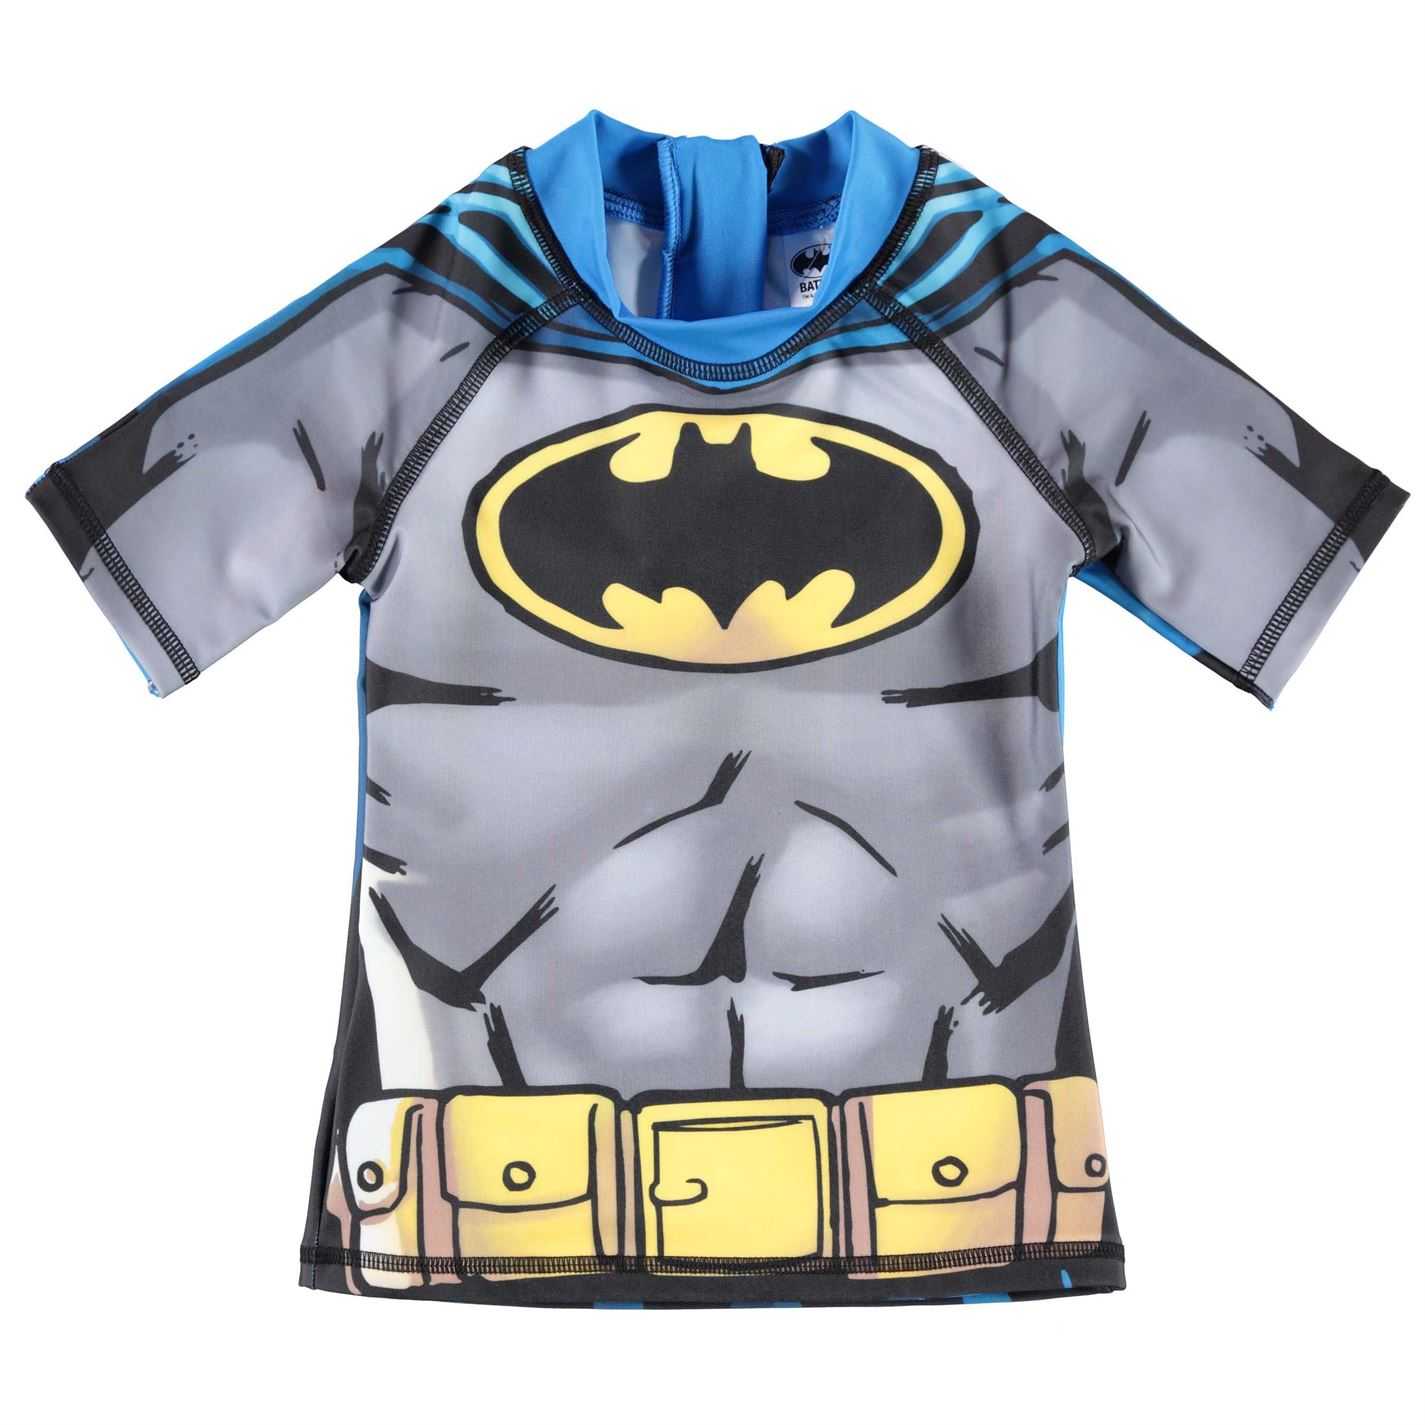 Character Kids Boys 2 Piece Swim Set Shorts T Shirt Tee Top Infant ... 1066ee12f8d8